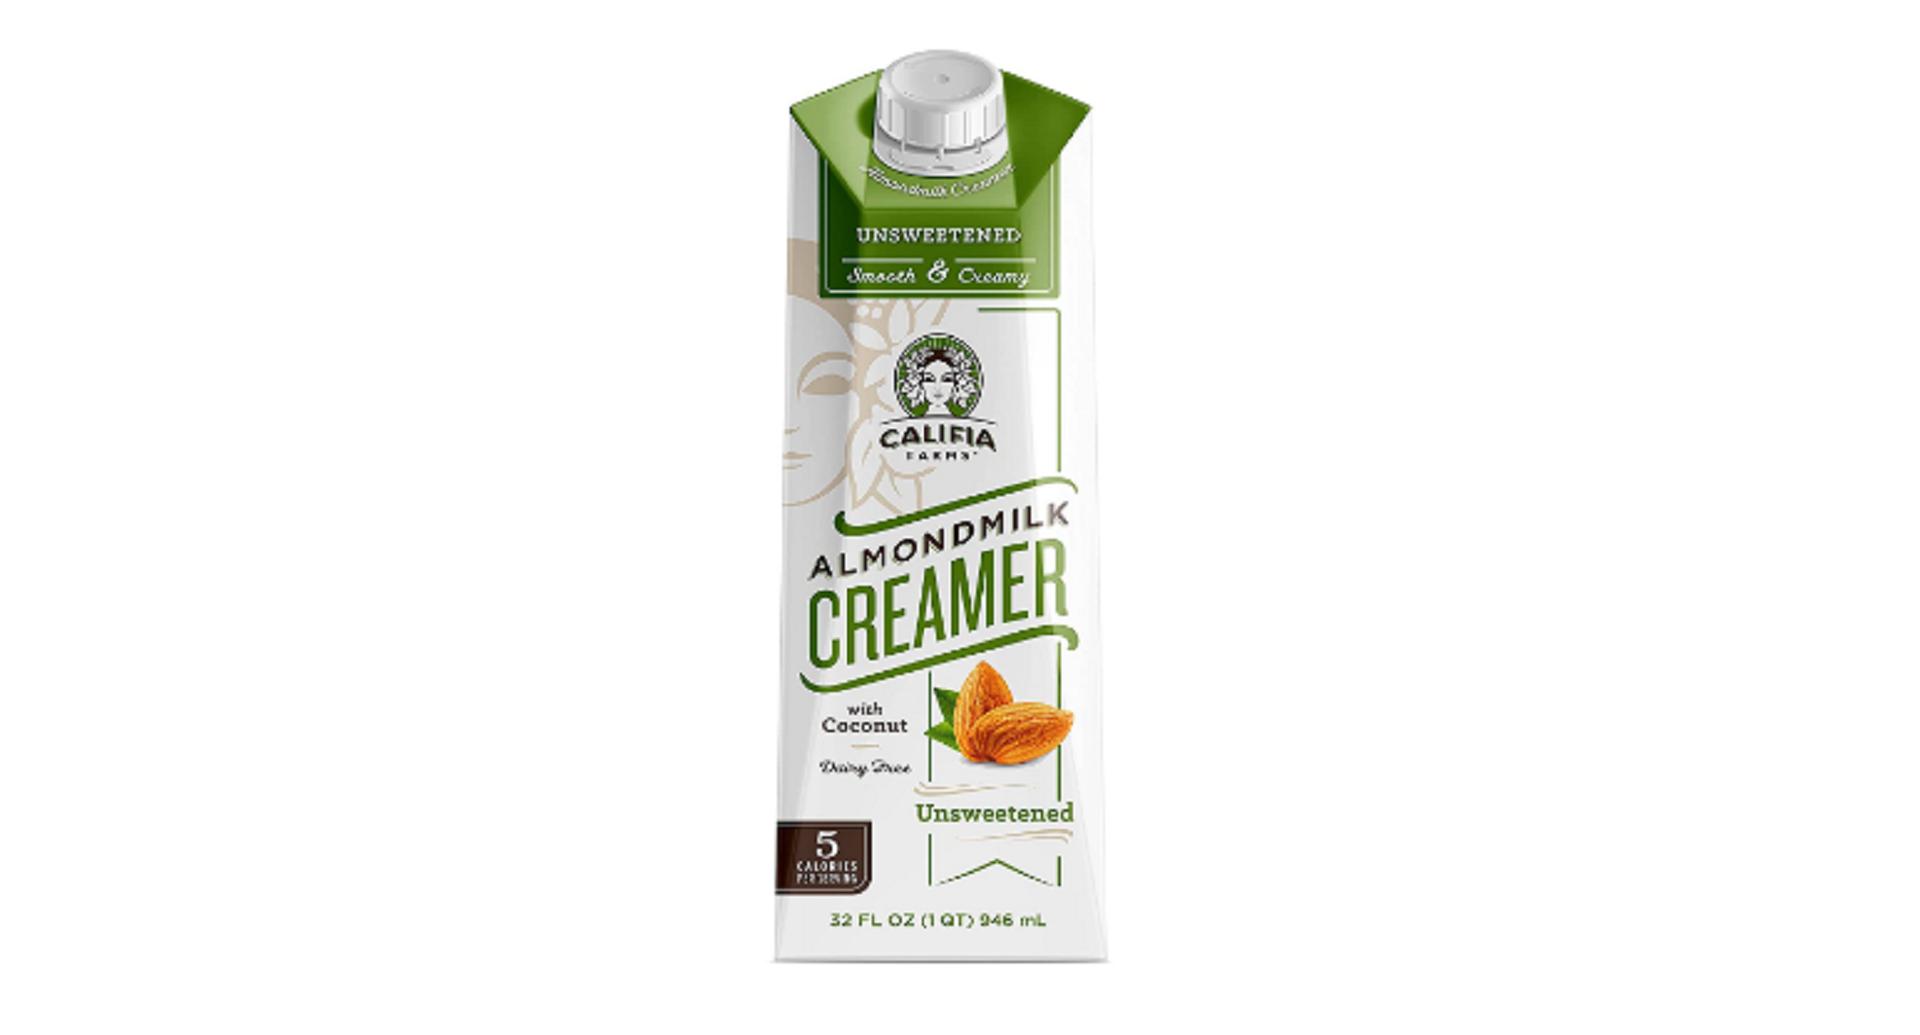 califia Farms coffee creamer